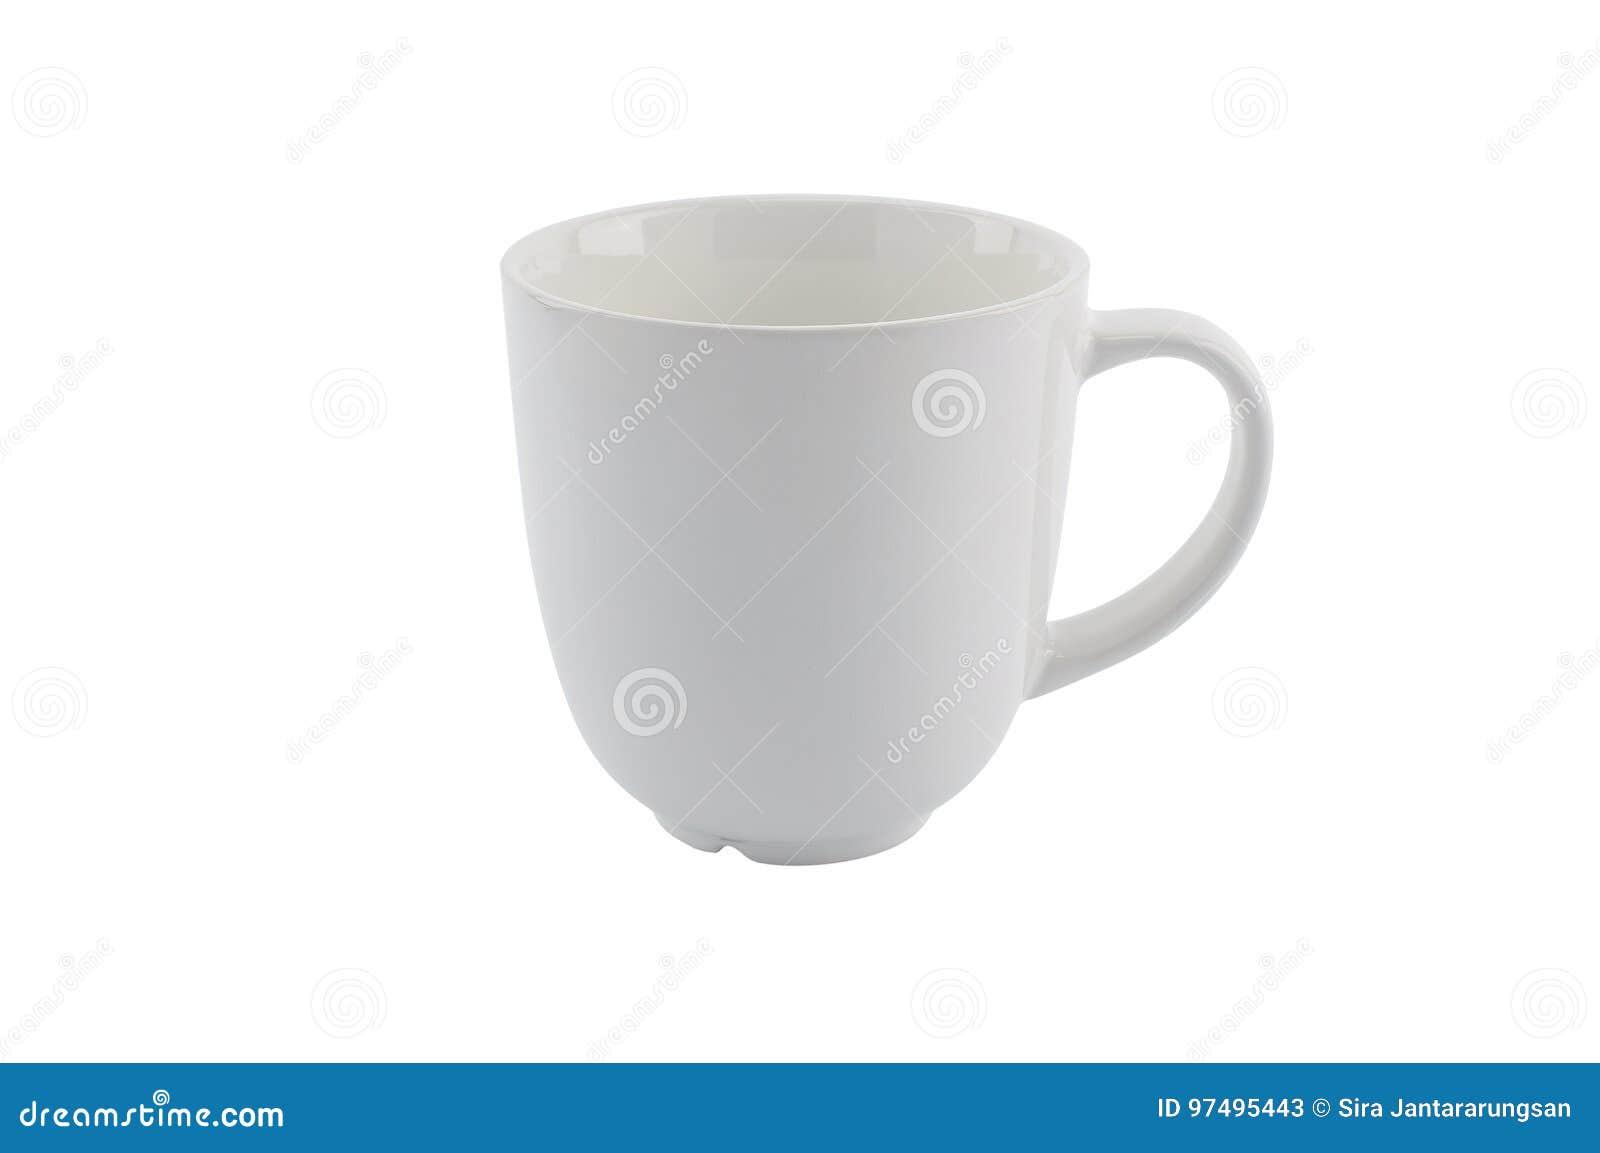 Tazza bianca vuota isolata su fondo bianco